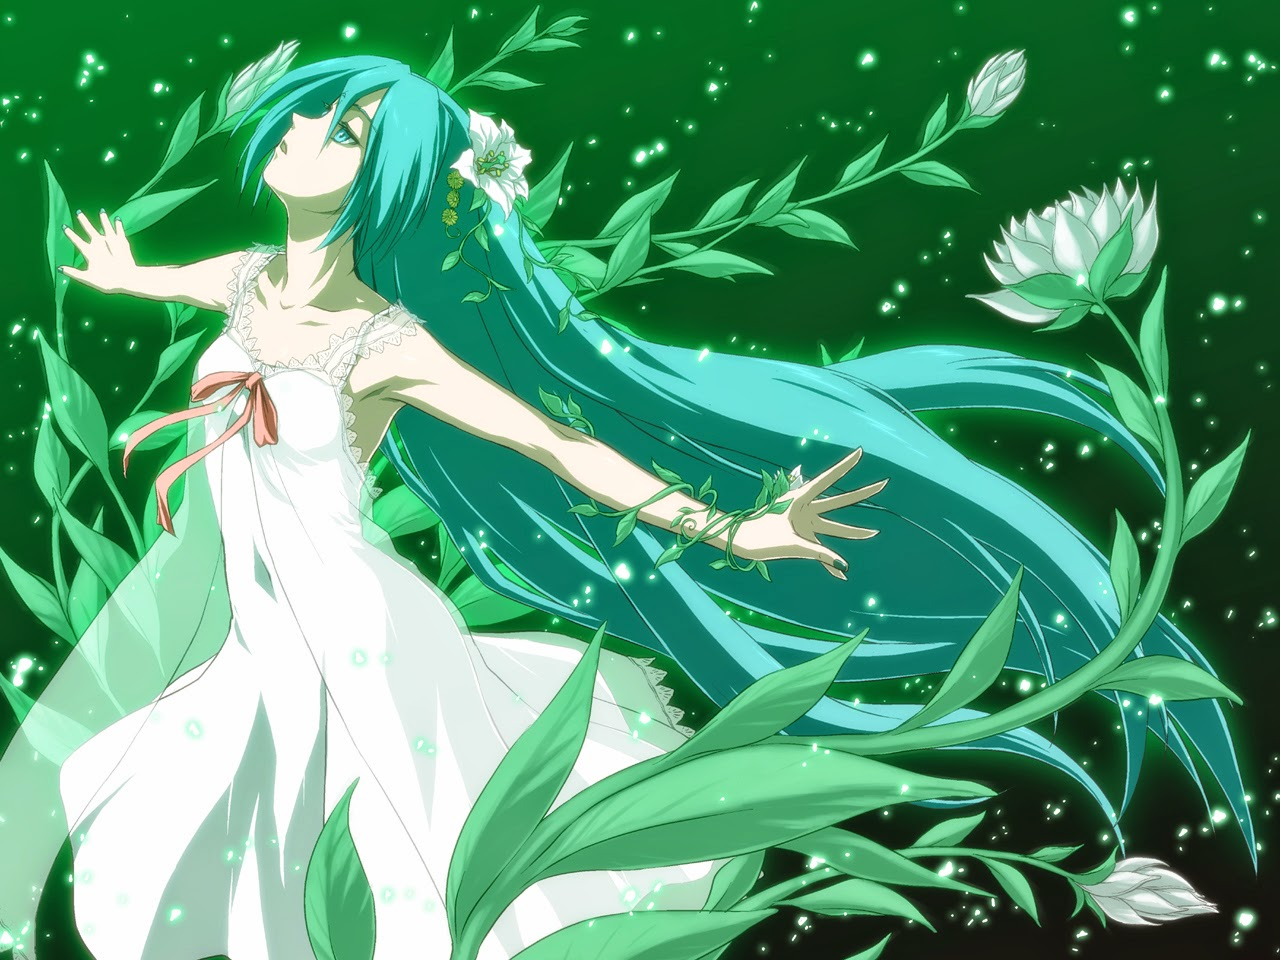 Beautiful Cartoon Girl Hd Wallpaper Hatsune Miku Desktop Backgrounds Beautiful Wallpapers